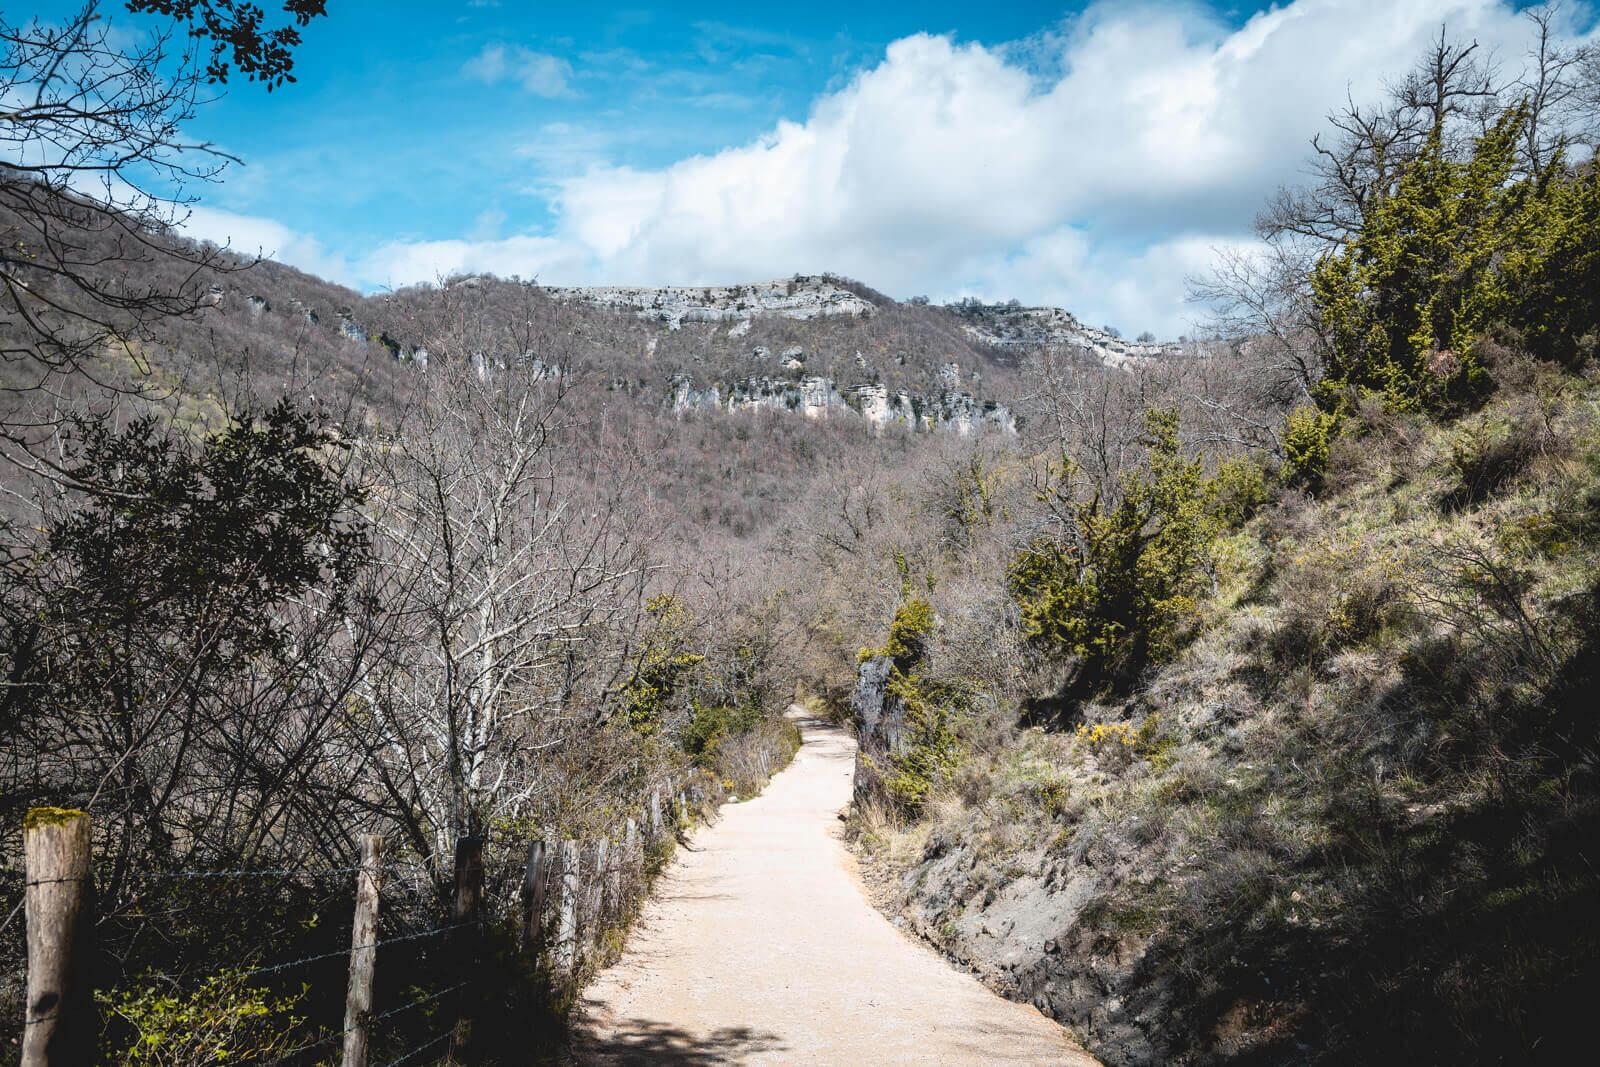 Gorges rivière Urederra Baquedano Navarre Espagne